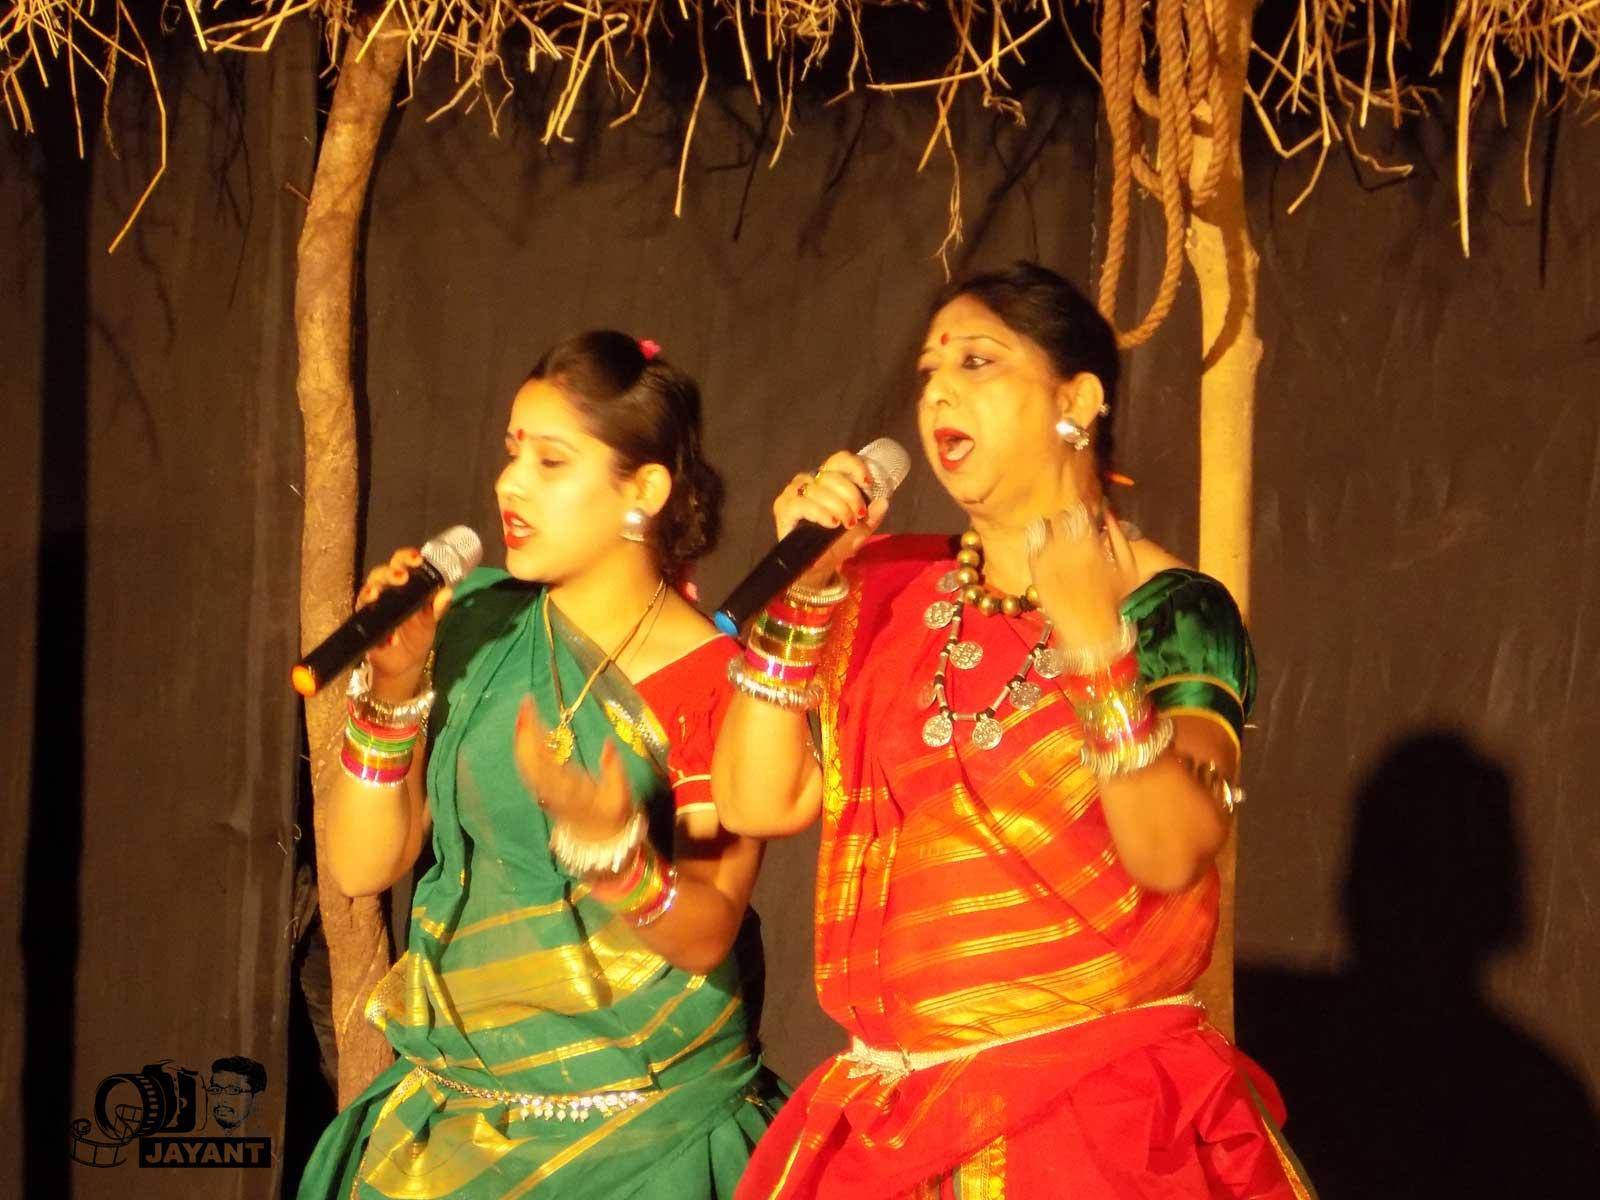 Jayant Gallery Dance Drama Raja Bharthari Presenting By